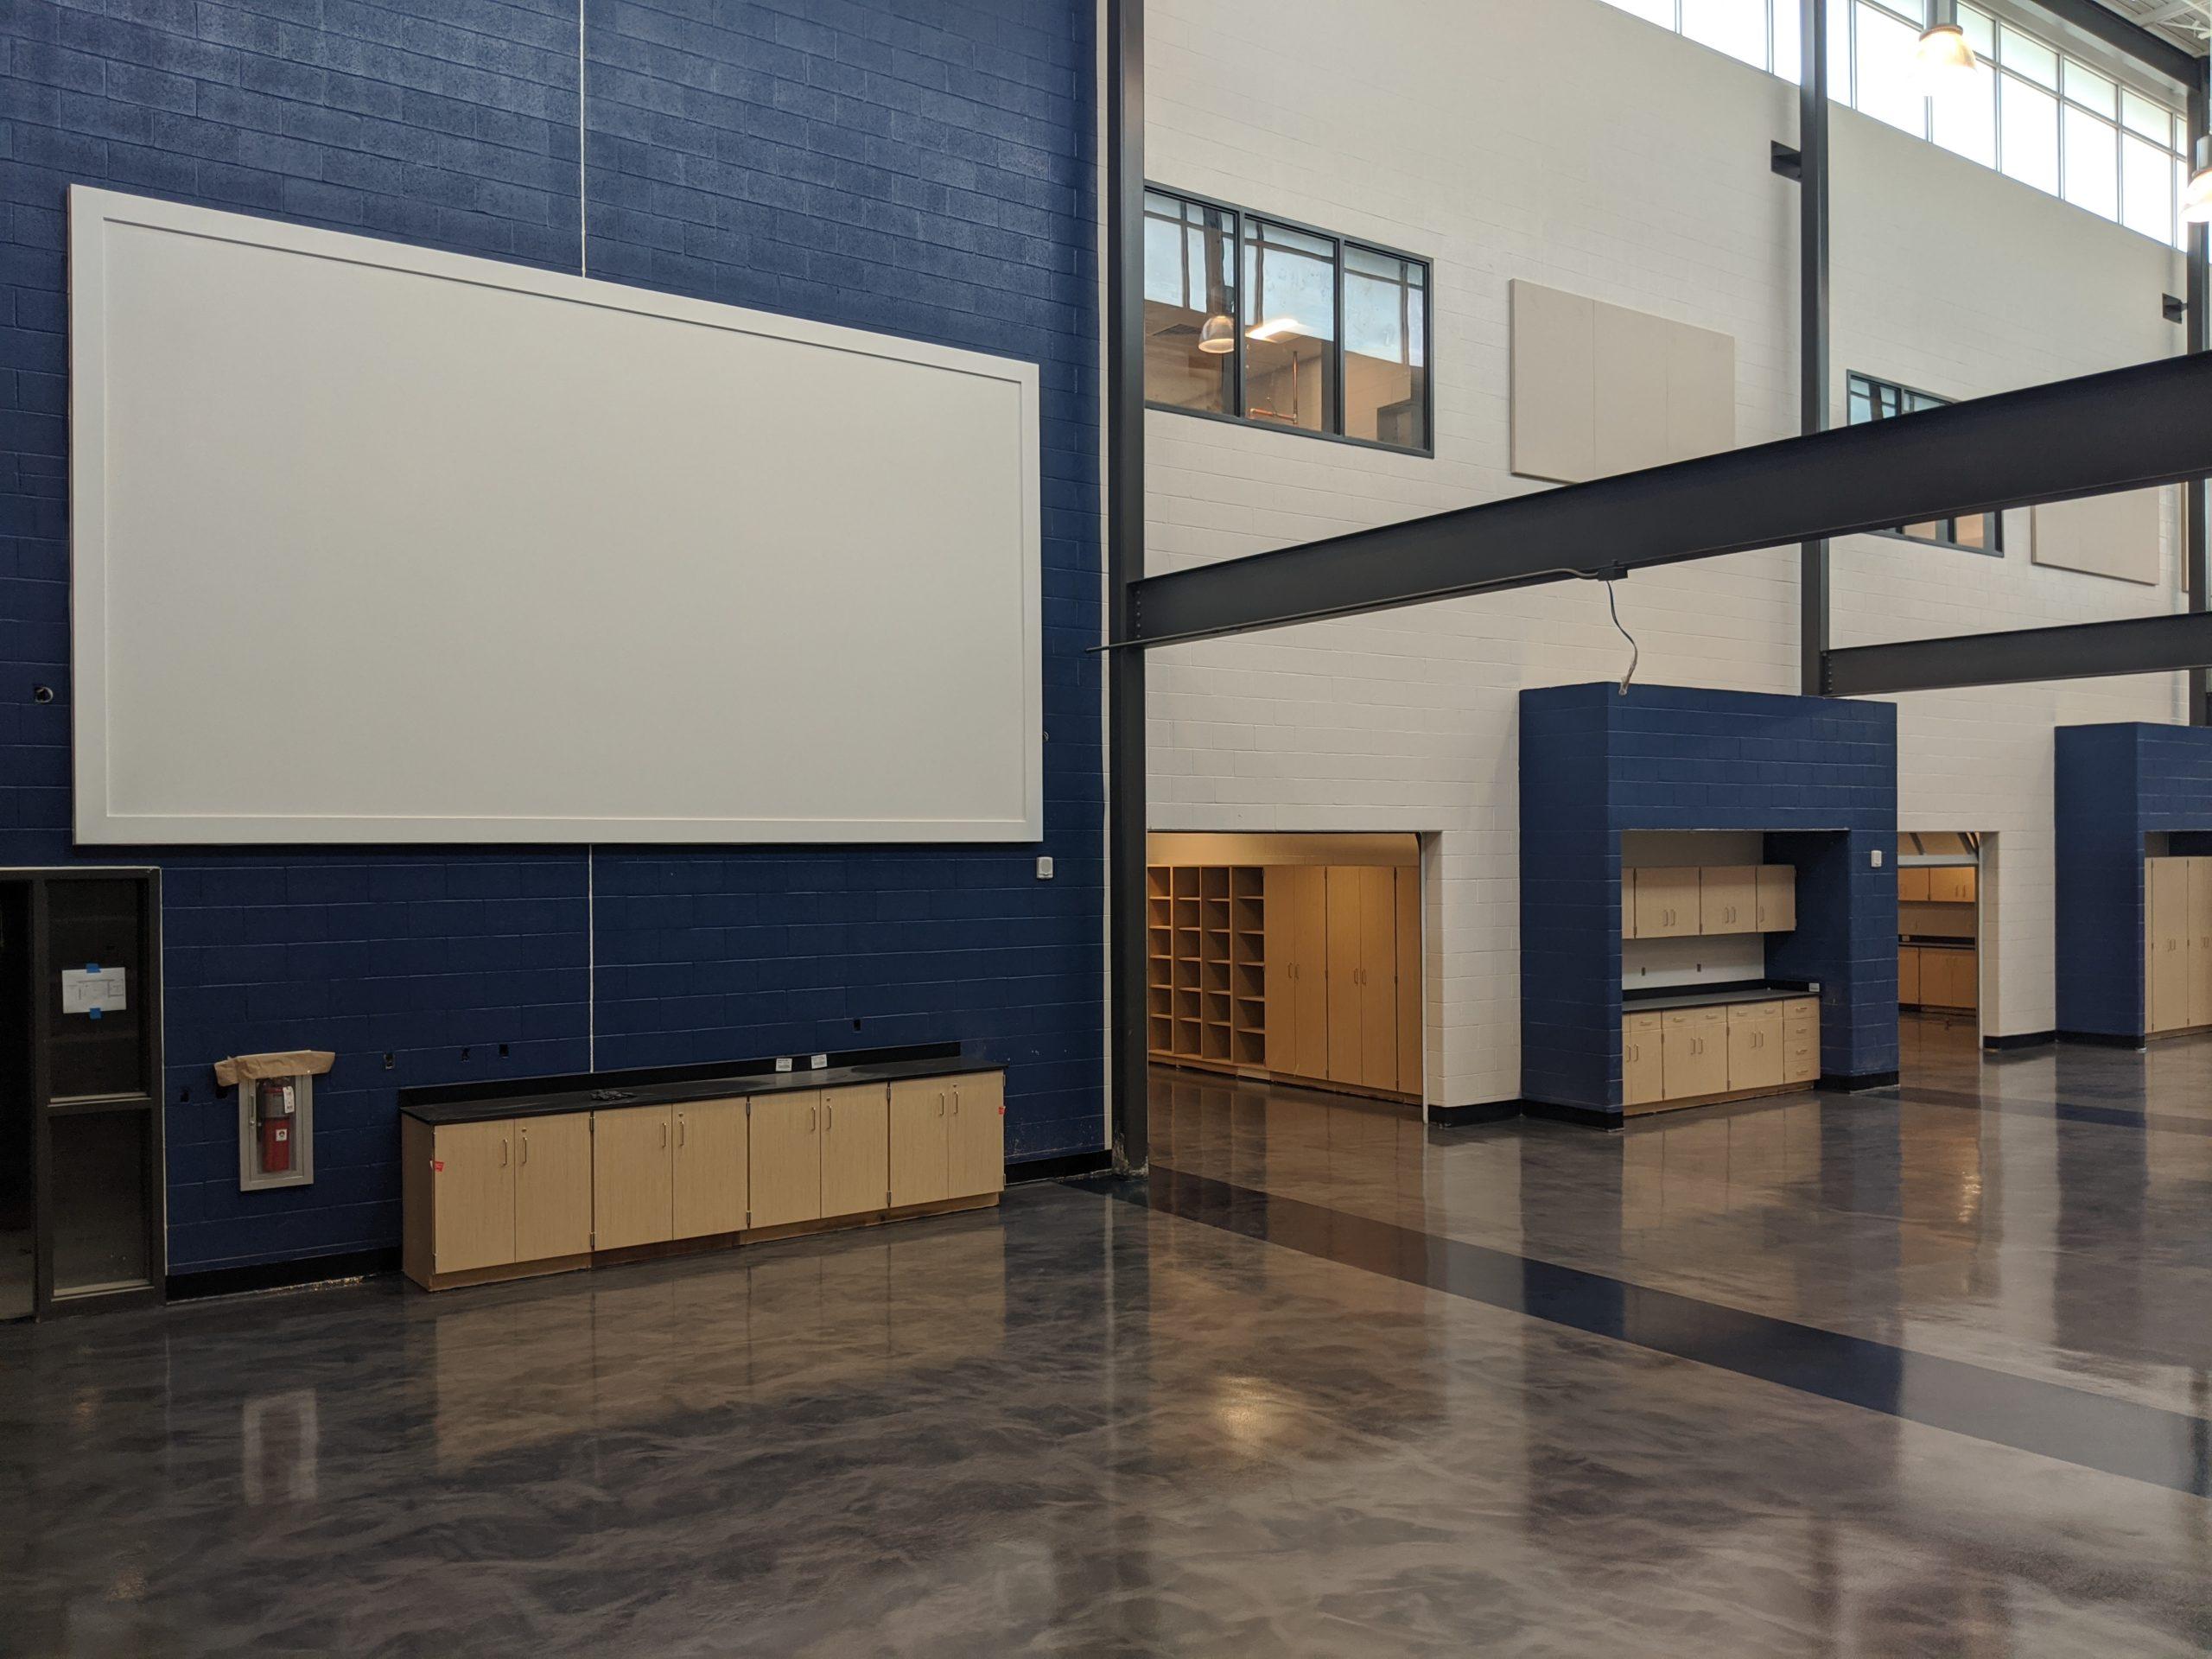 HS STEM Lobby August 2020